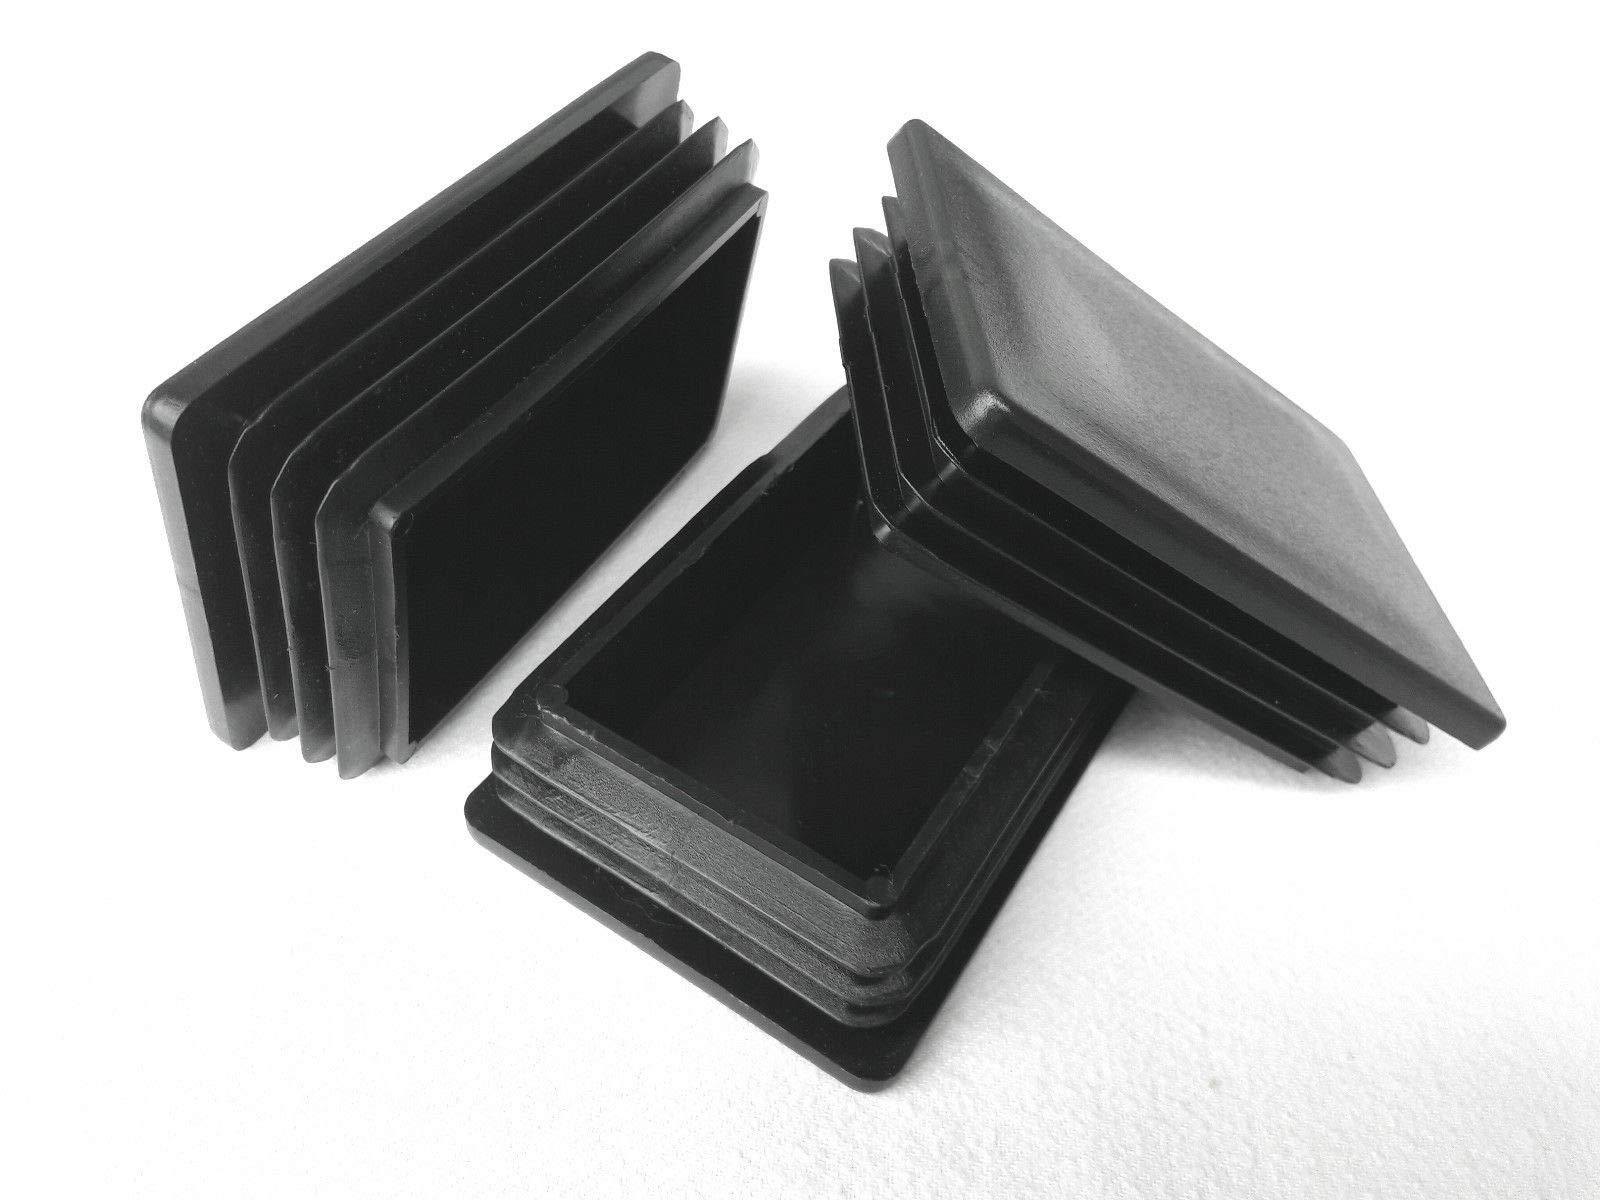 80 x 120 mm 10 x 20 mm 10 tapones rectangulares//tapones de tubo